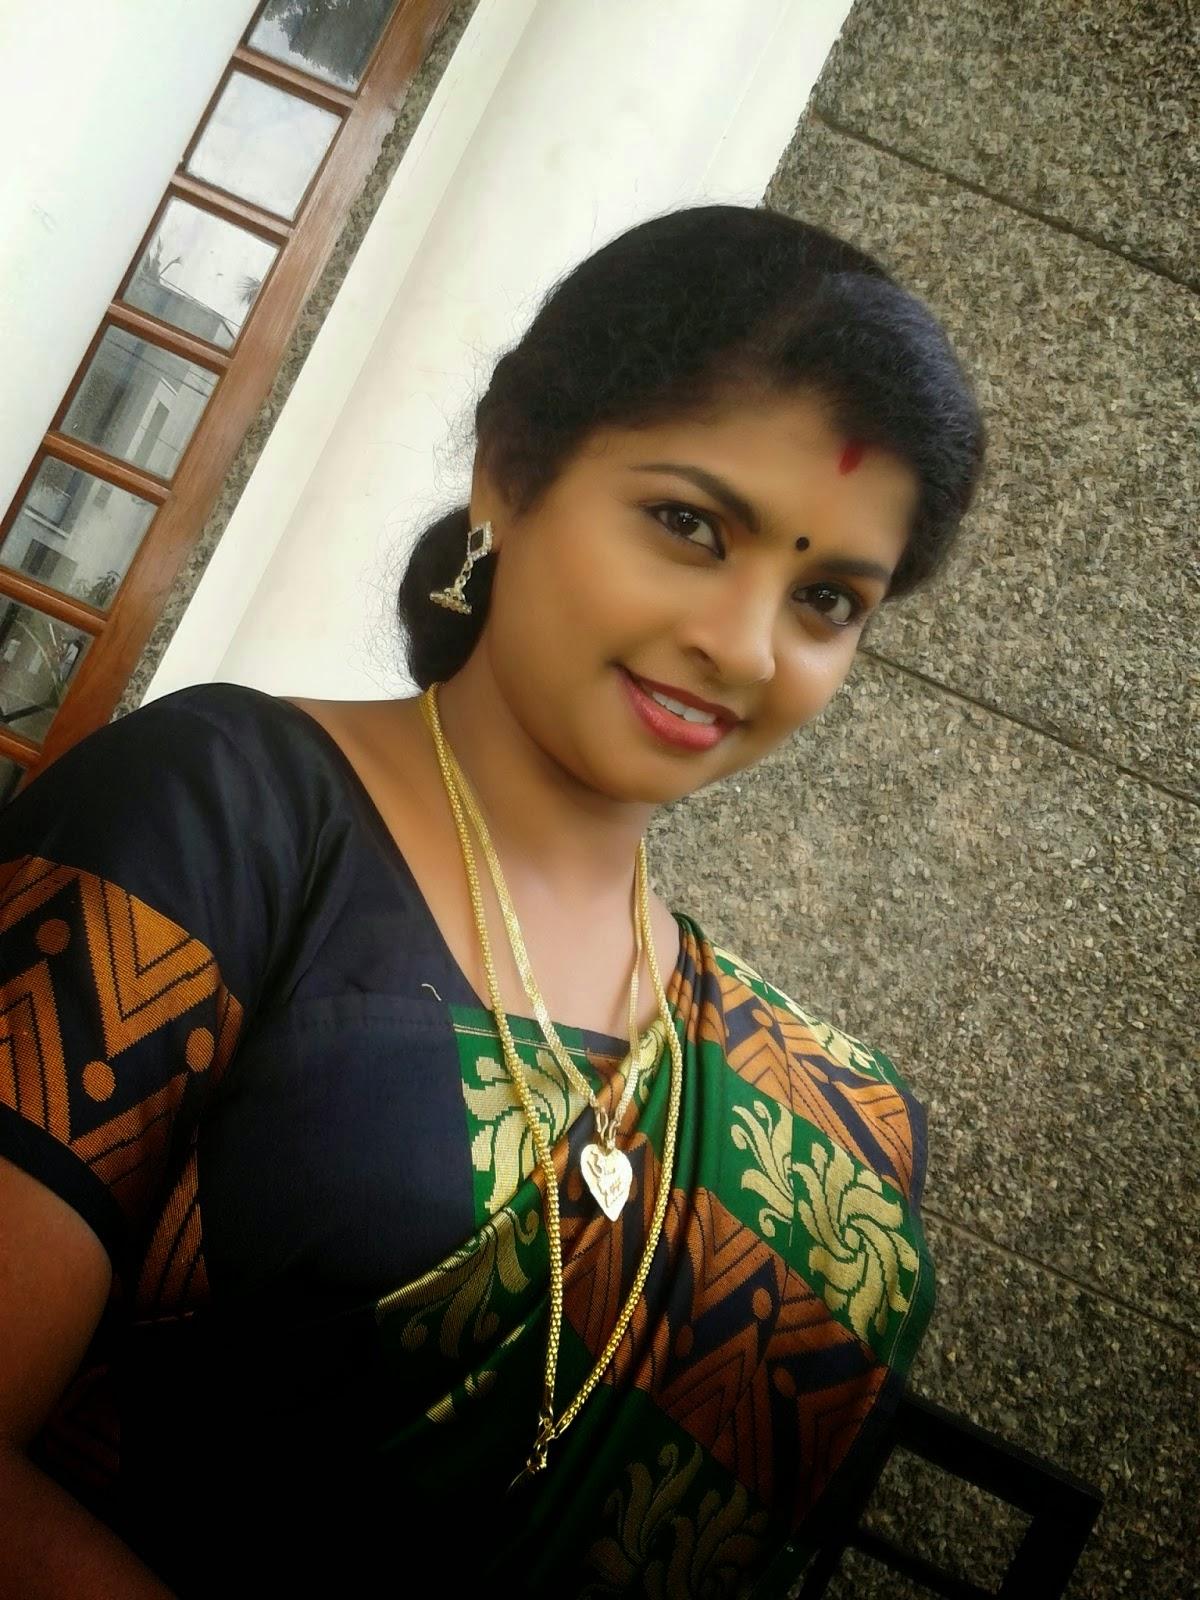 Malayalam Mallu Aunty Photos Pundai Tamil Aunties Pictures -6236